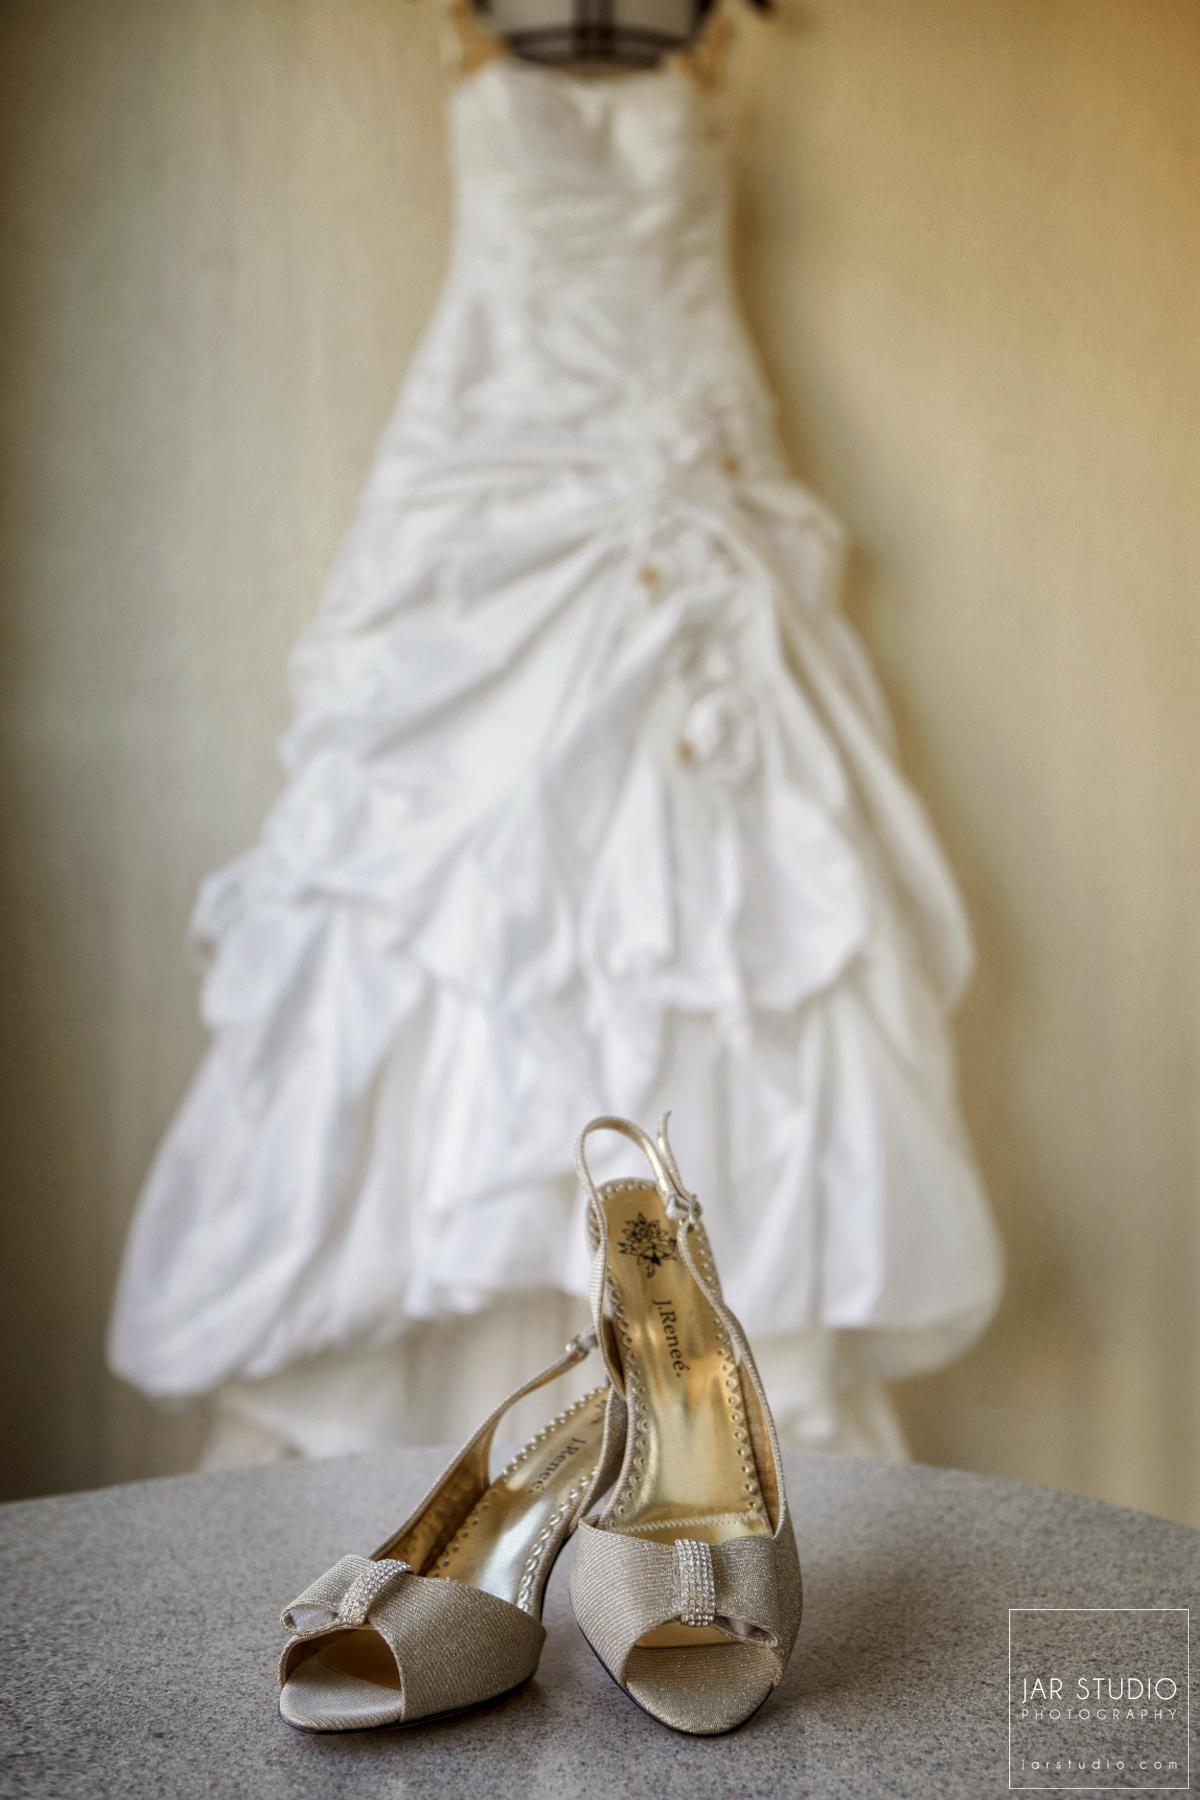 01-elegant-luxury-wedding-shoes-dress-orlando-weddings-jarstudio.JPG